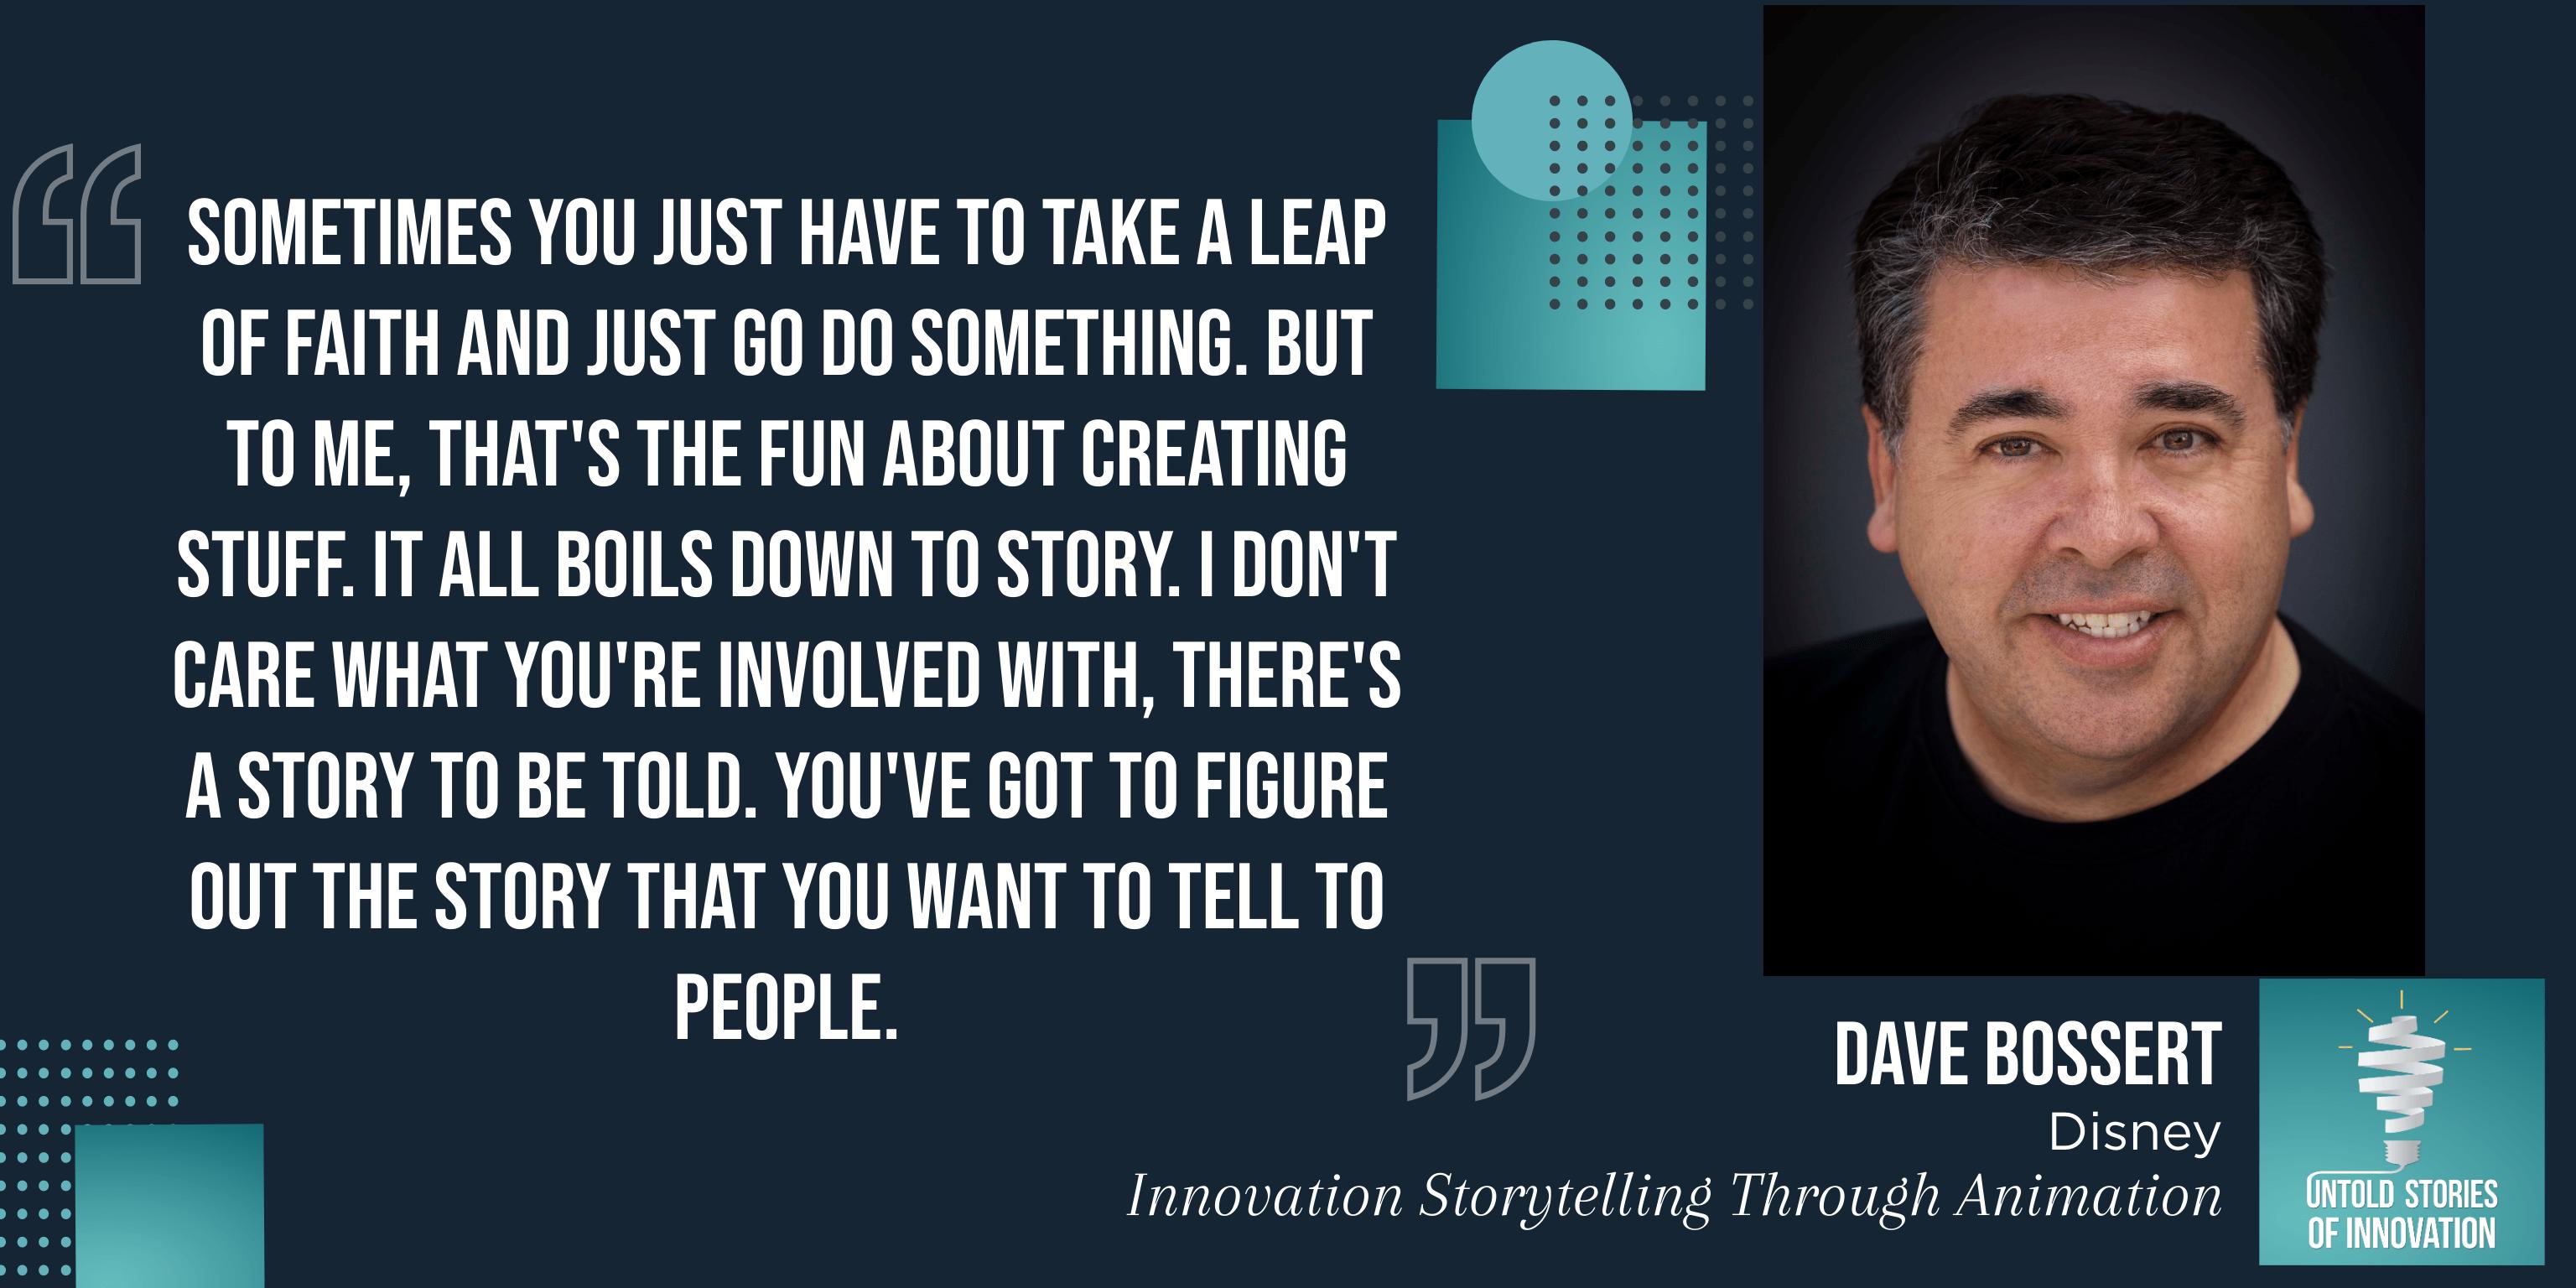 Innovation Storytelling Through Animation Dave Bossert Quote Image